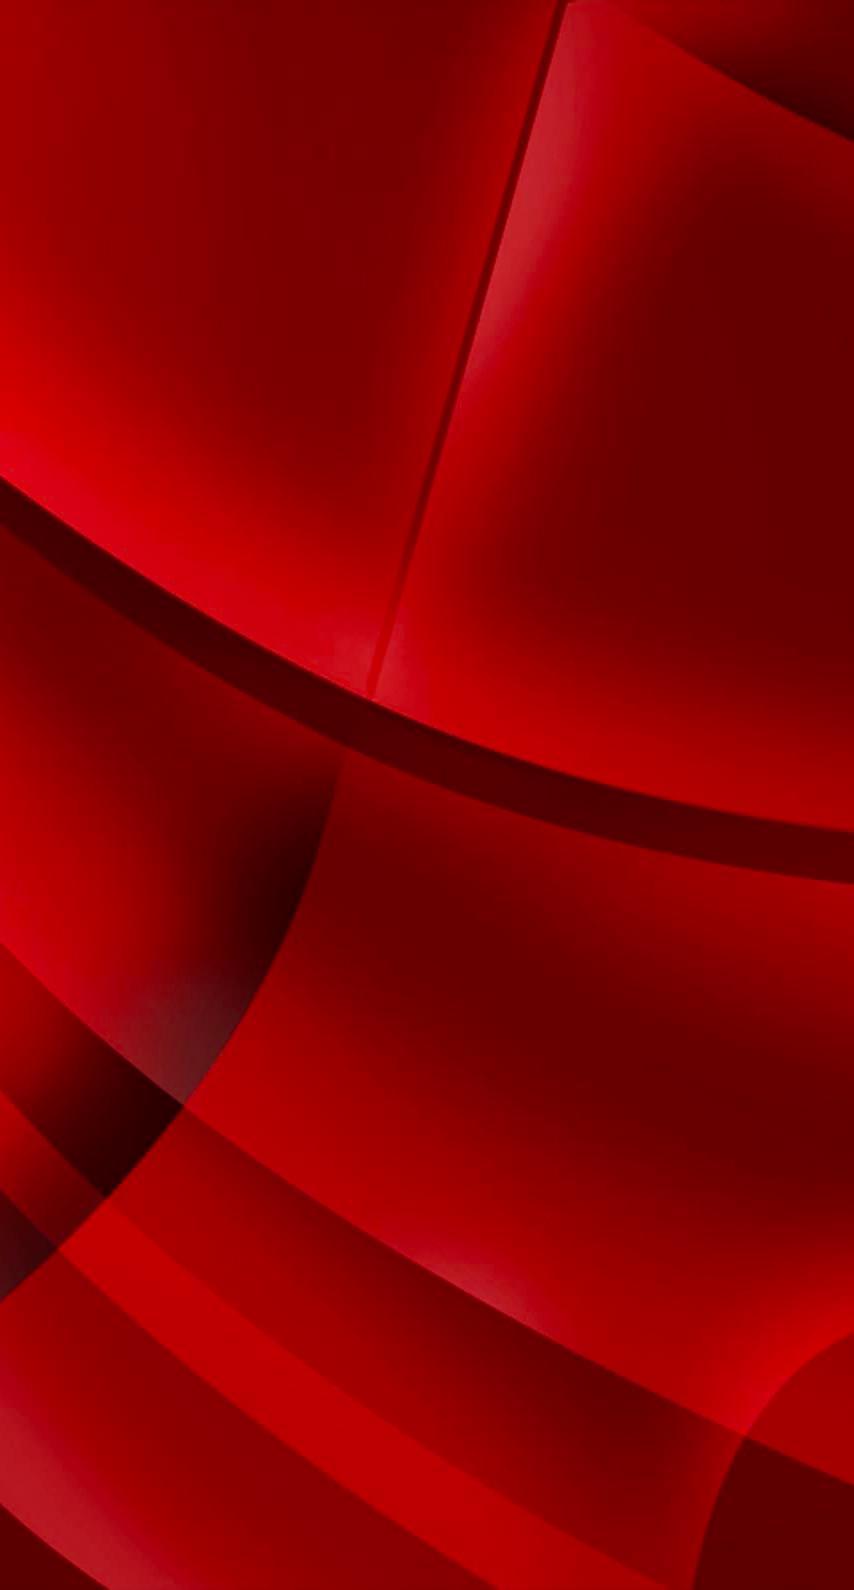 wallpaper merah maroon,red,orange,close up,line,automotive design ...